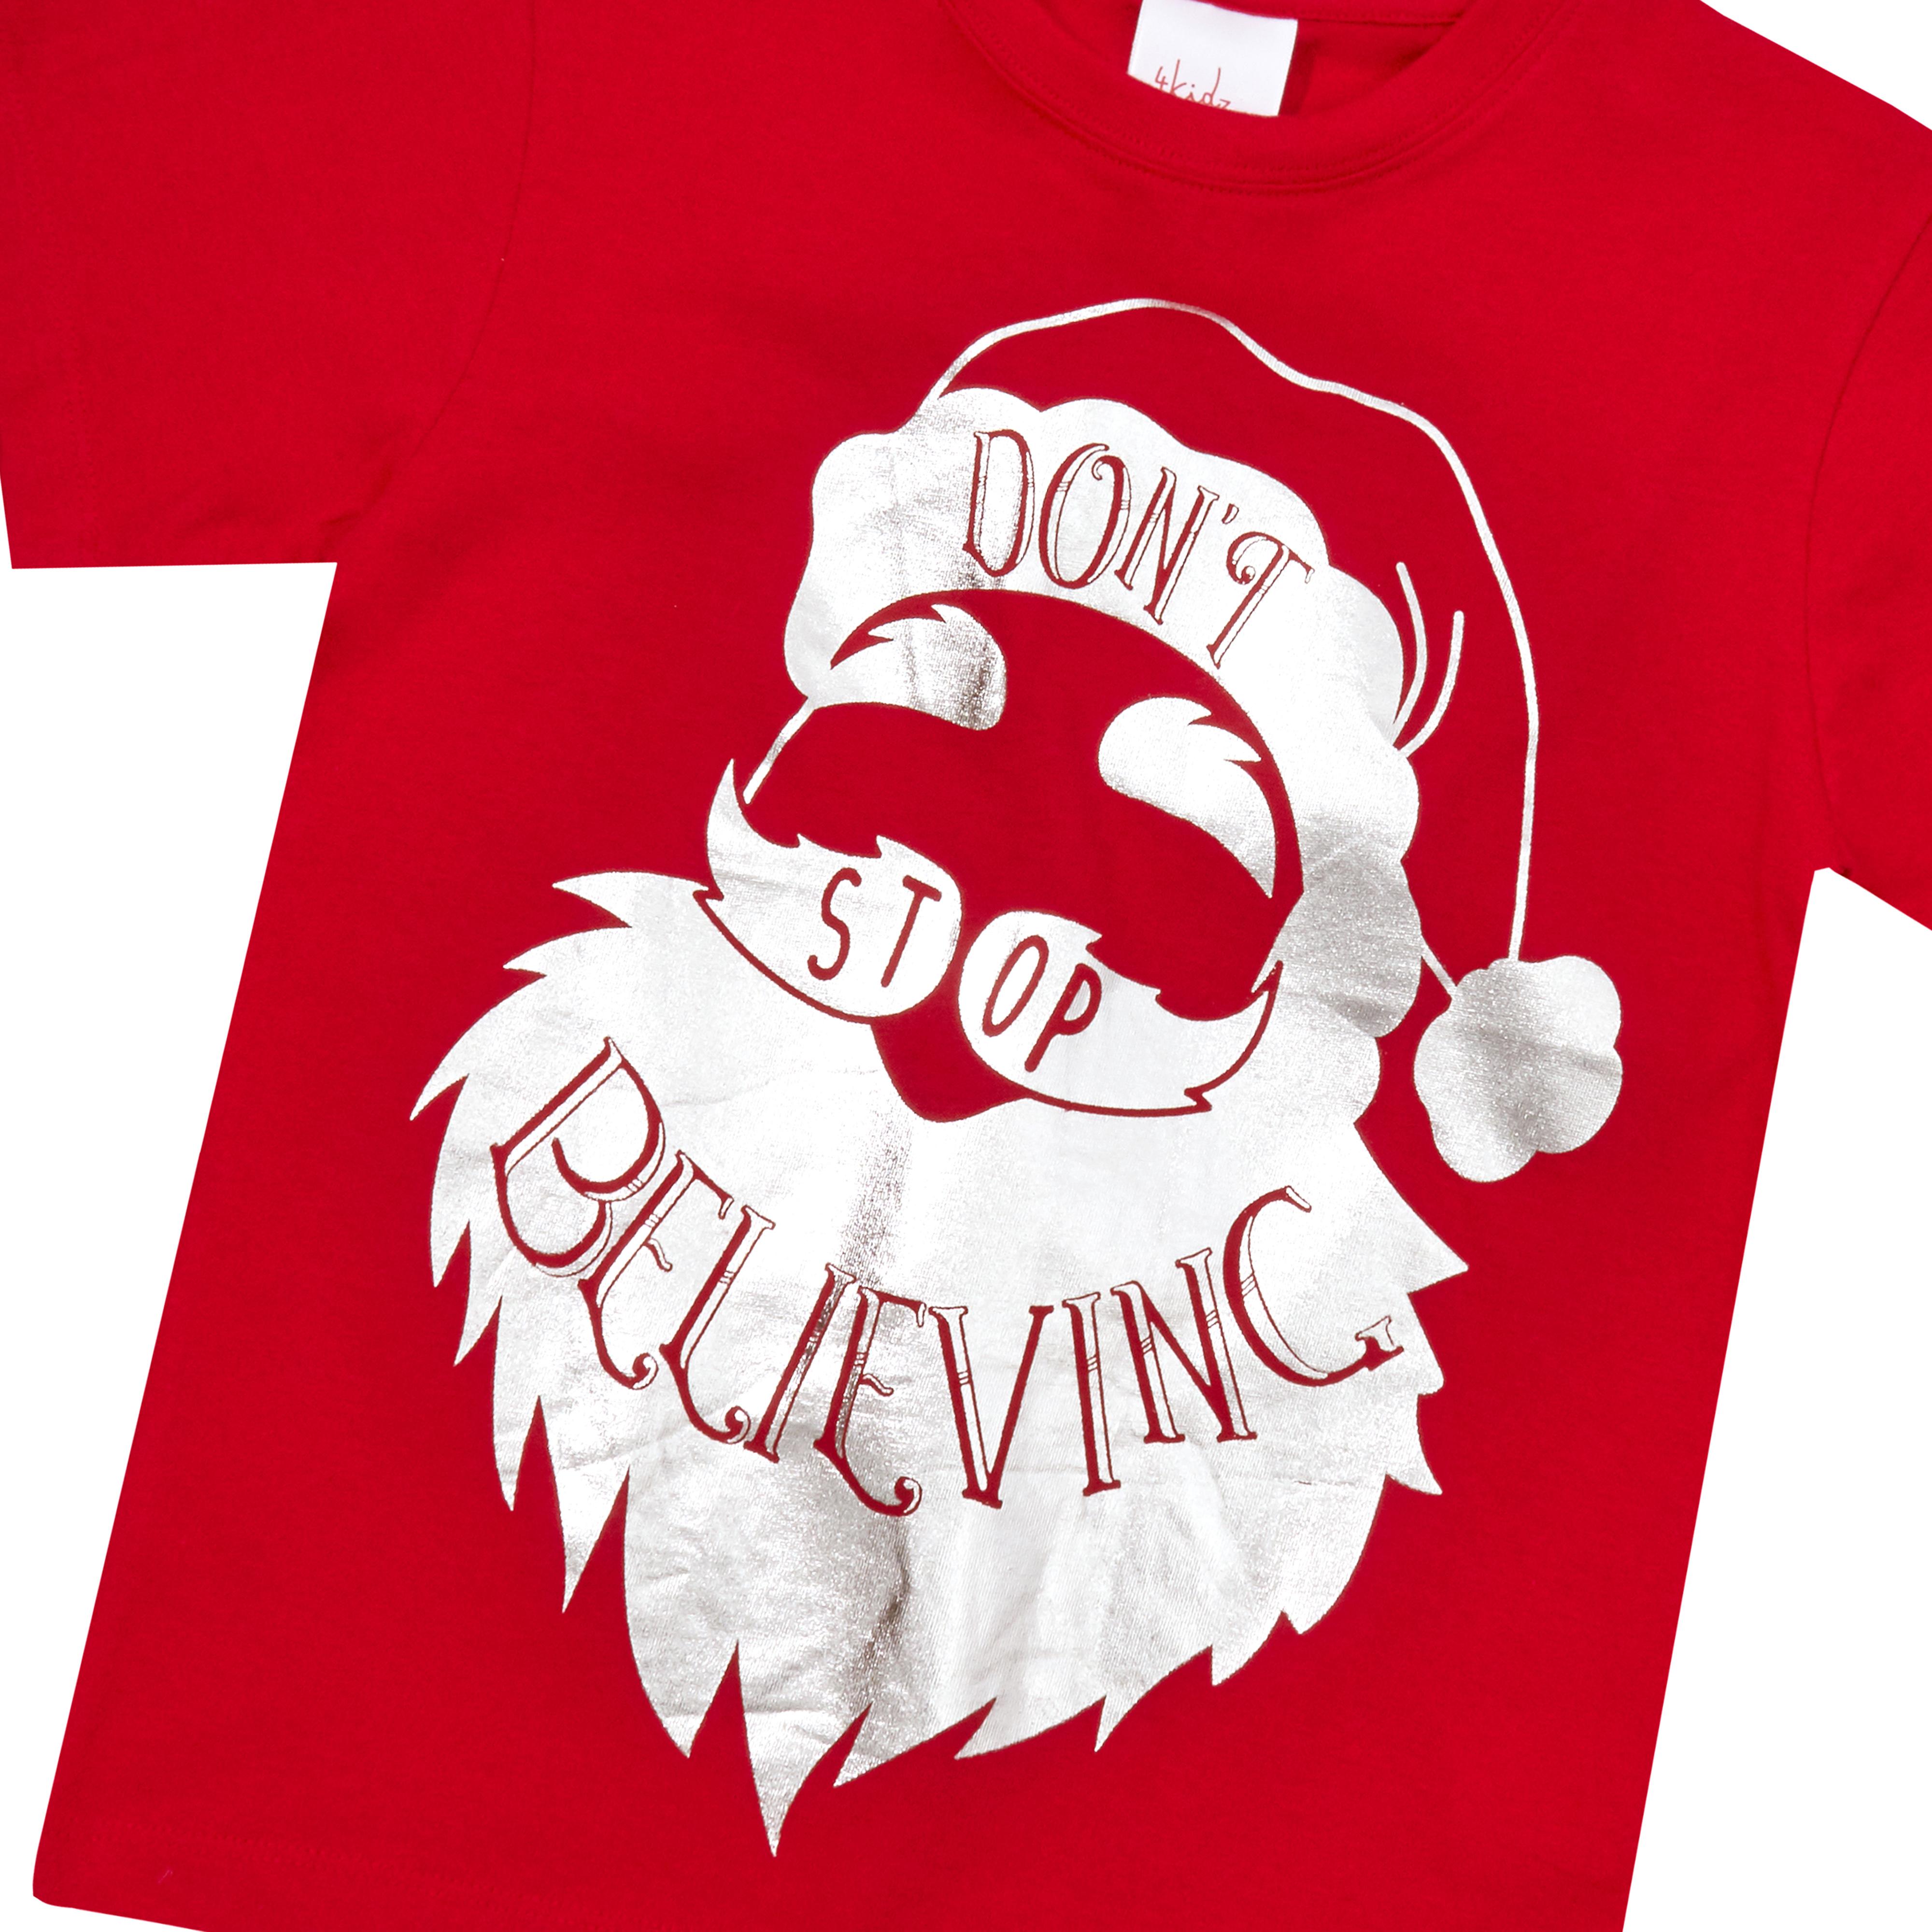 Childrens-Girls-Boys-Xmas-T-Shirts-Printed-Christmas-Design-100-Cotton-2-13-Yrs thumbnail 7